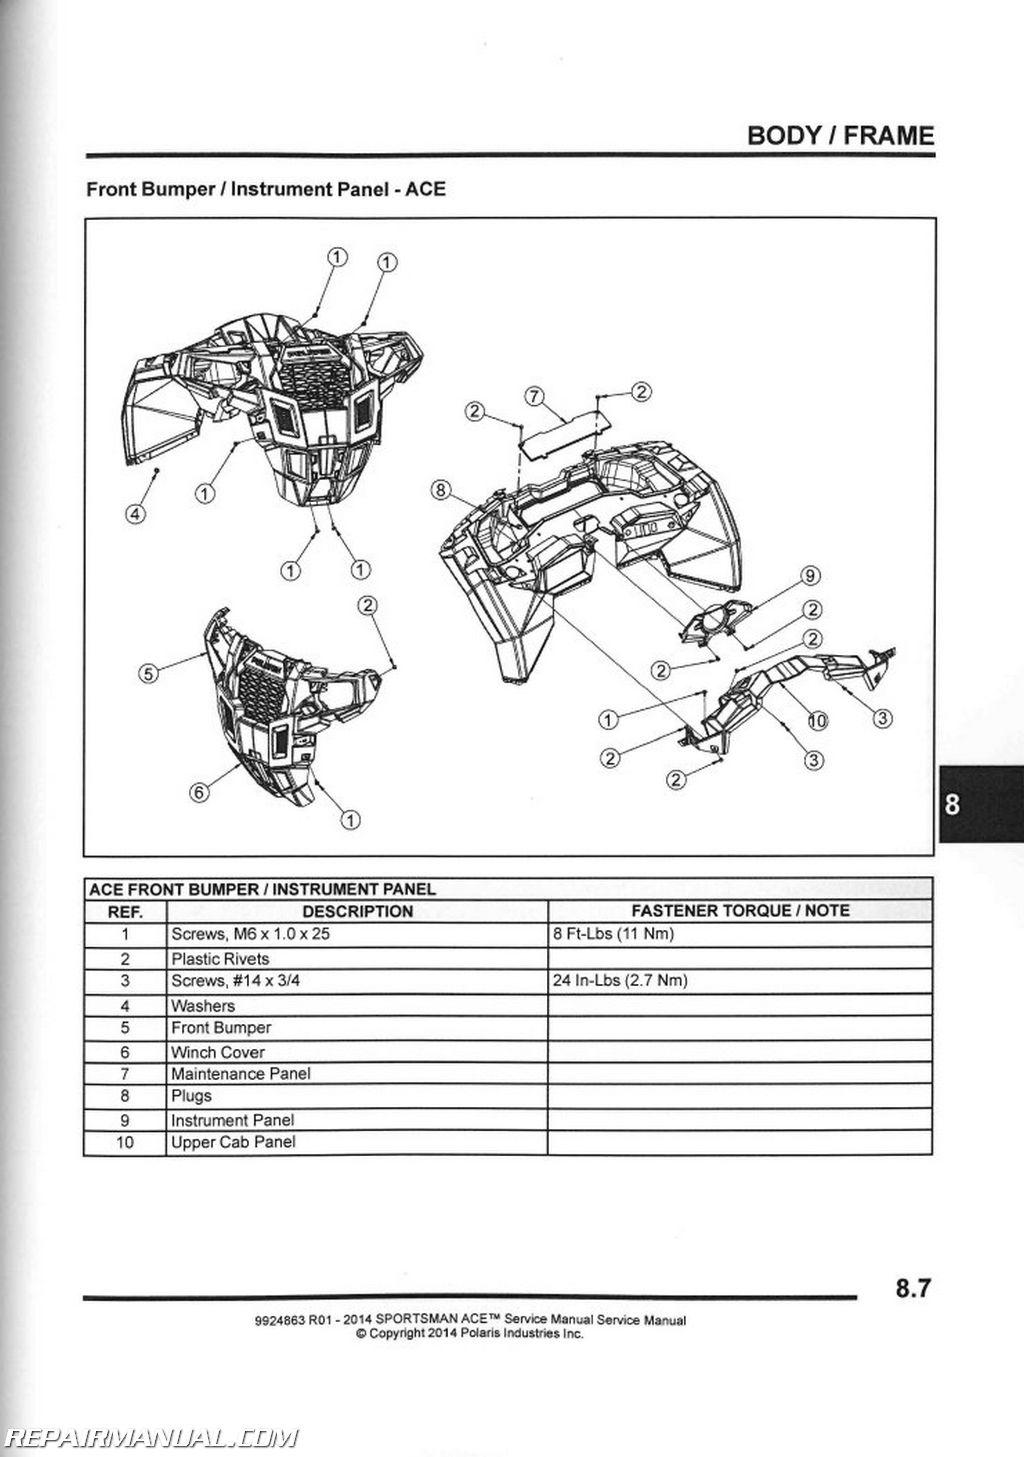 06 polaris predator 500 wiring diagram kohler ignition switch ranger fuse box free for you sportsman 400 library rh 98 trgy org 2004 location 2012